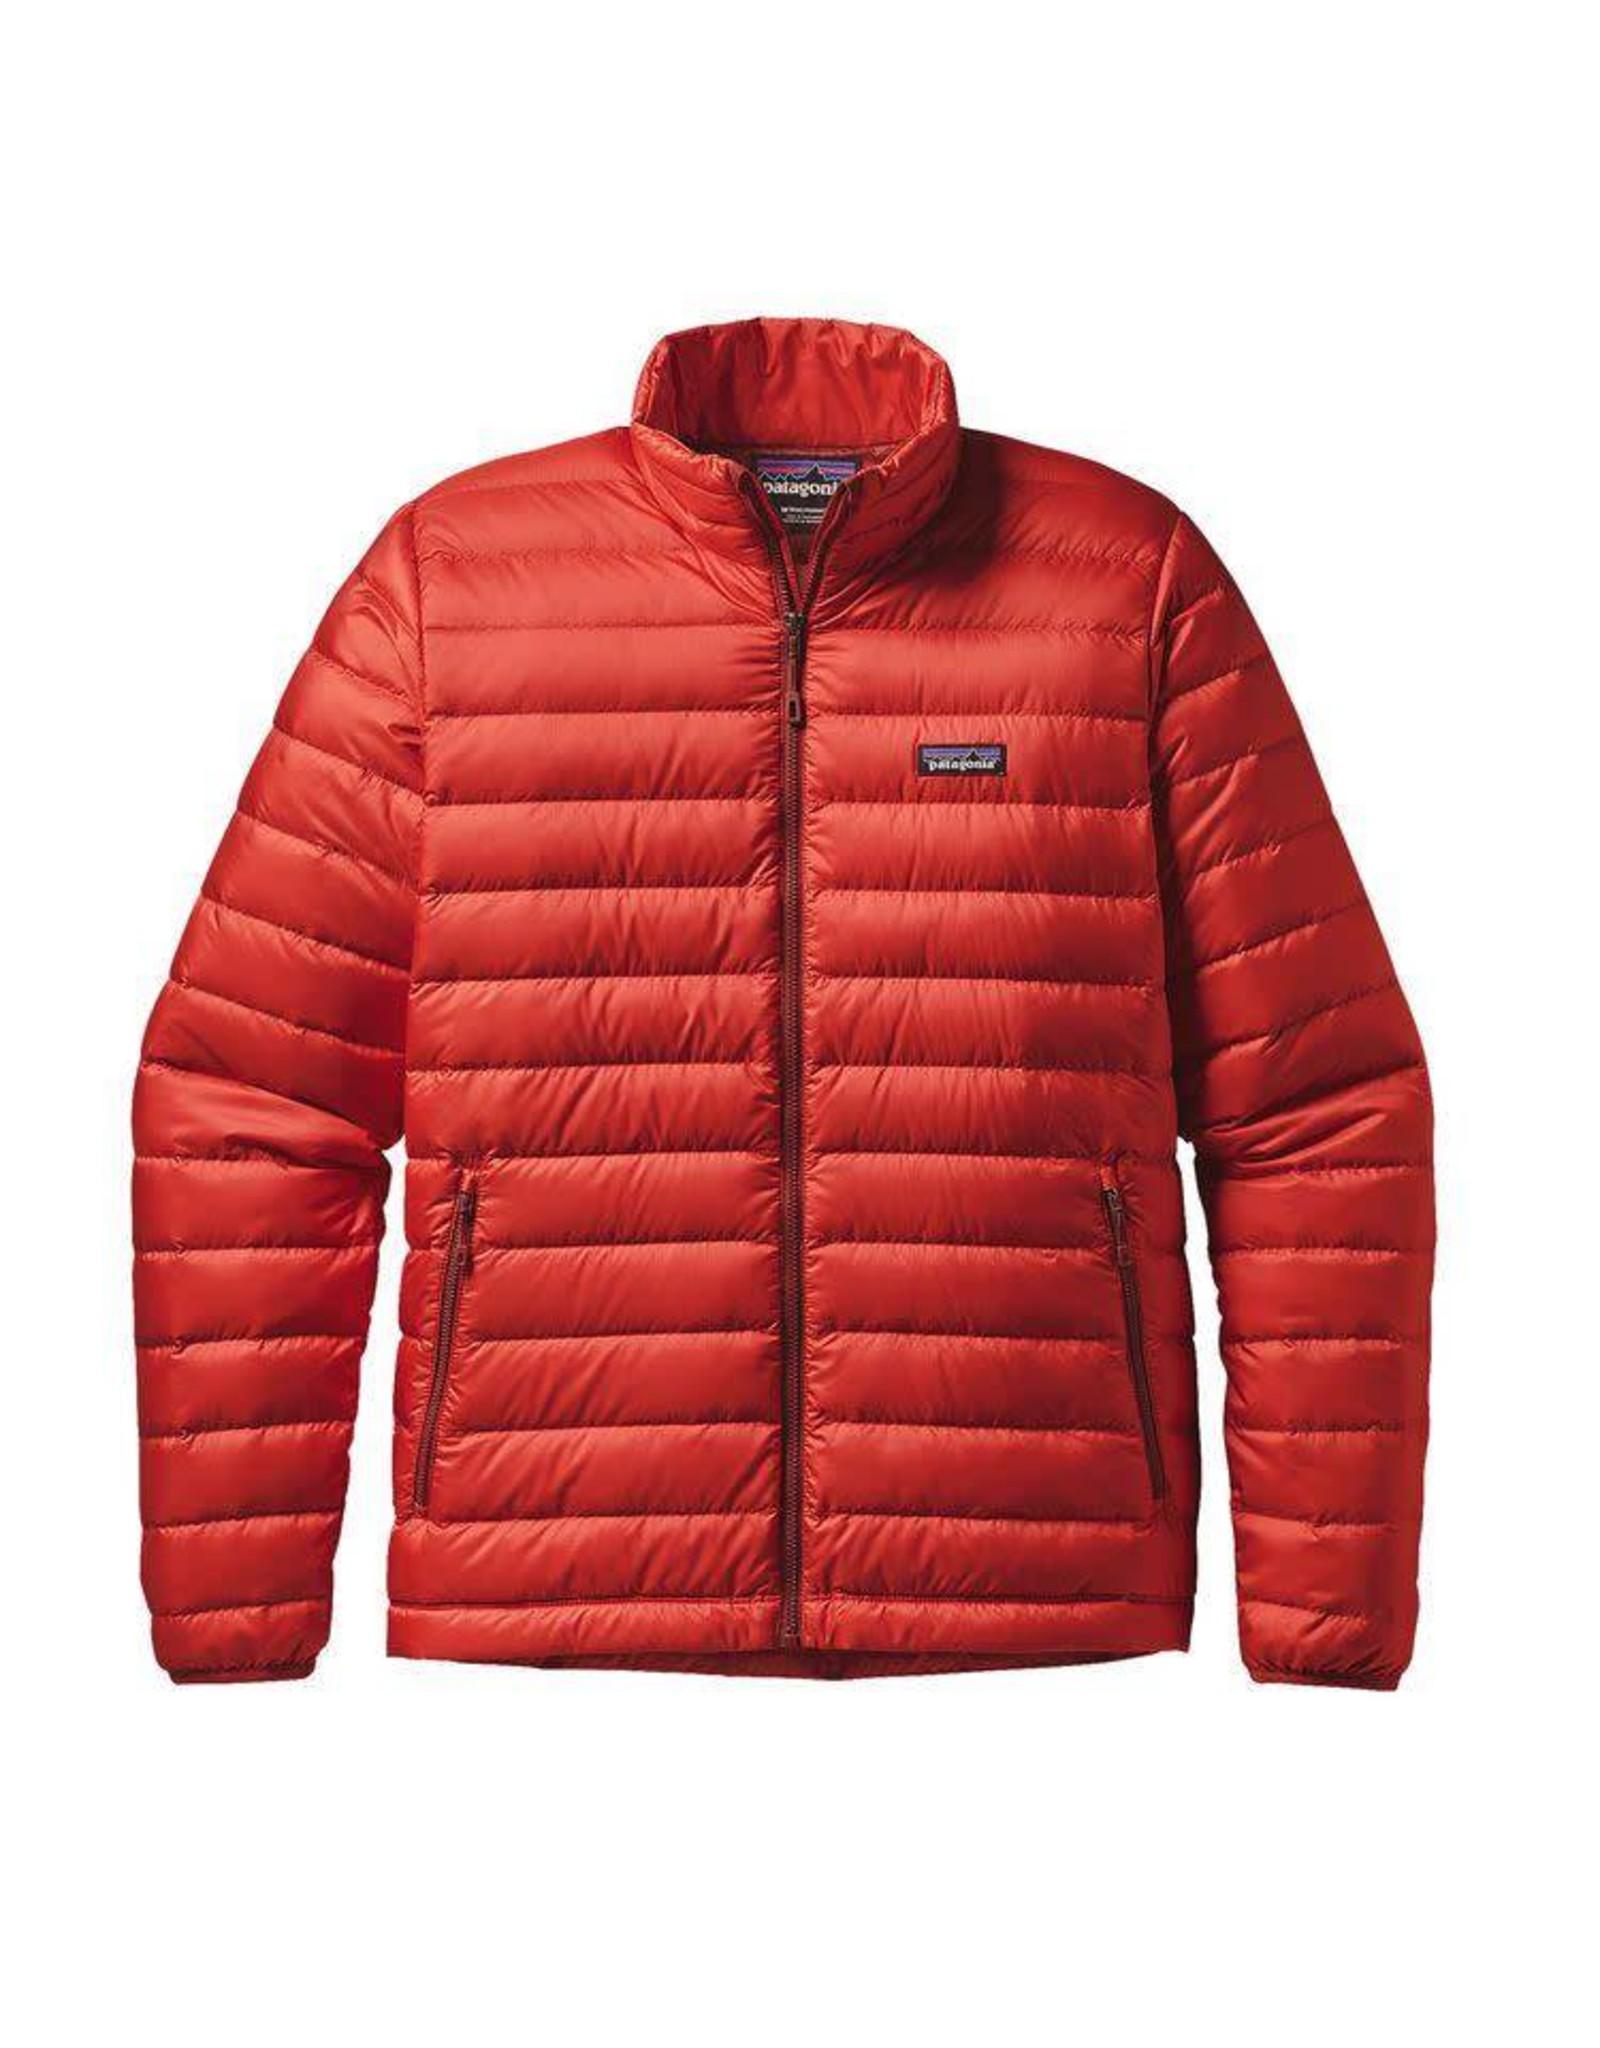 Patagonia Patagonia M's Down Sweater